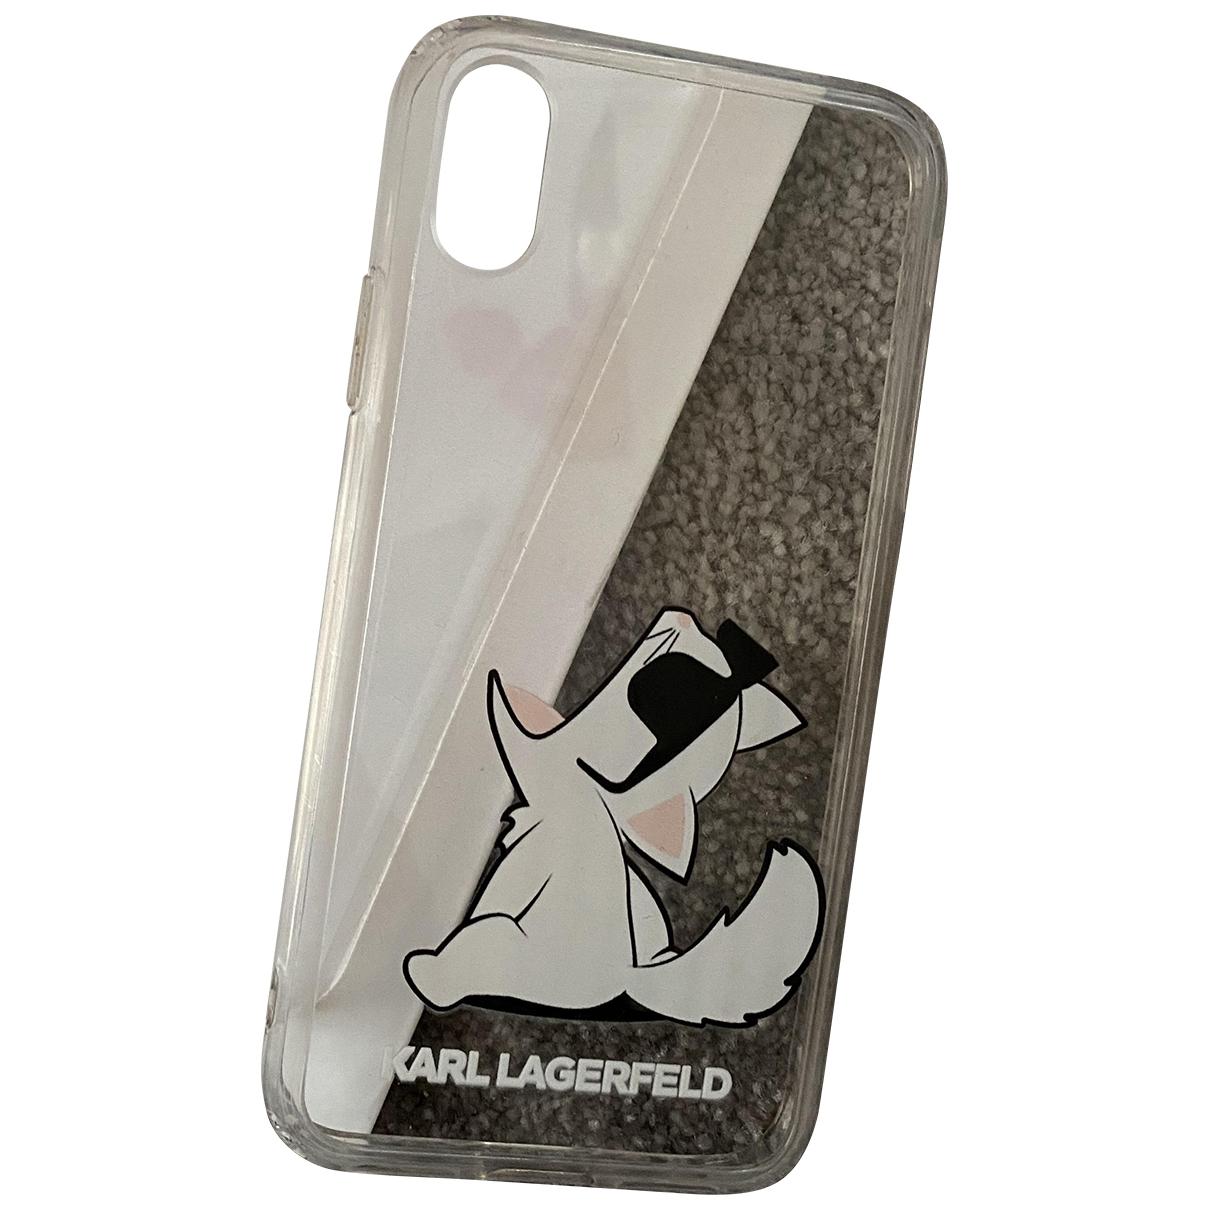 Karl Lagerfeld - Accessoires   pour lifestyle